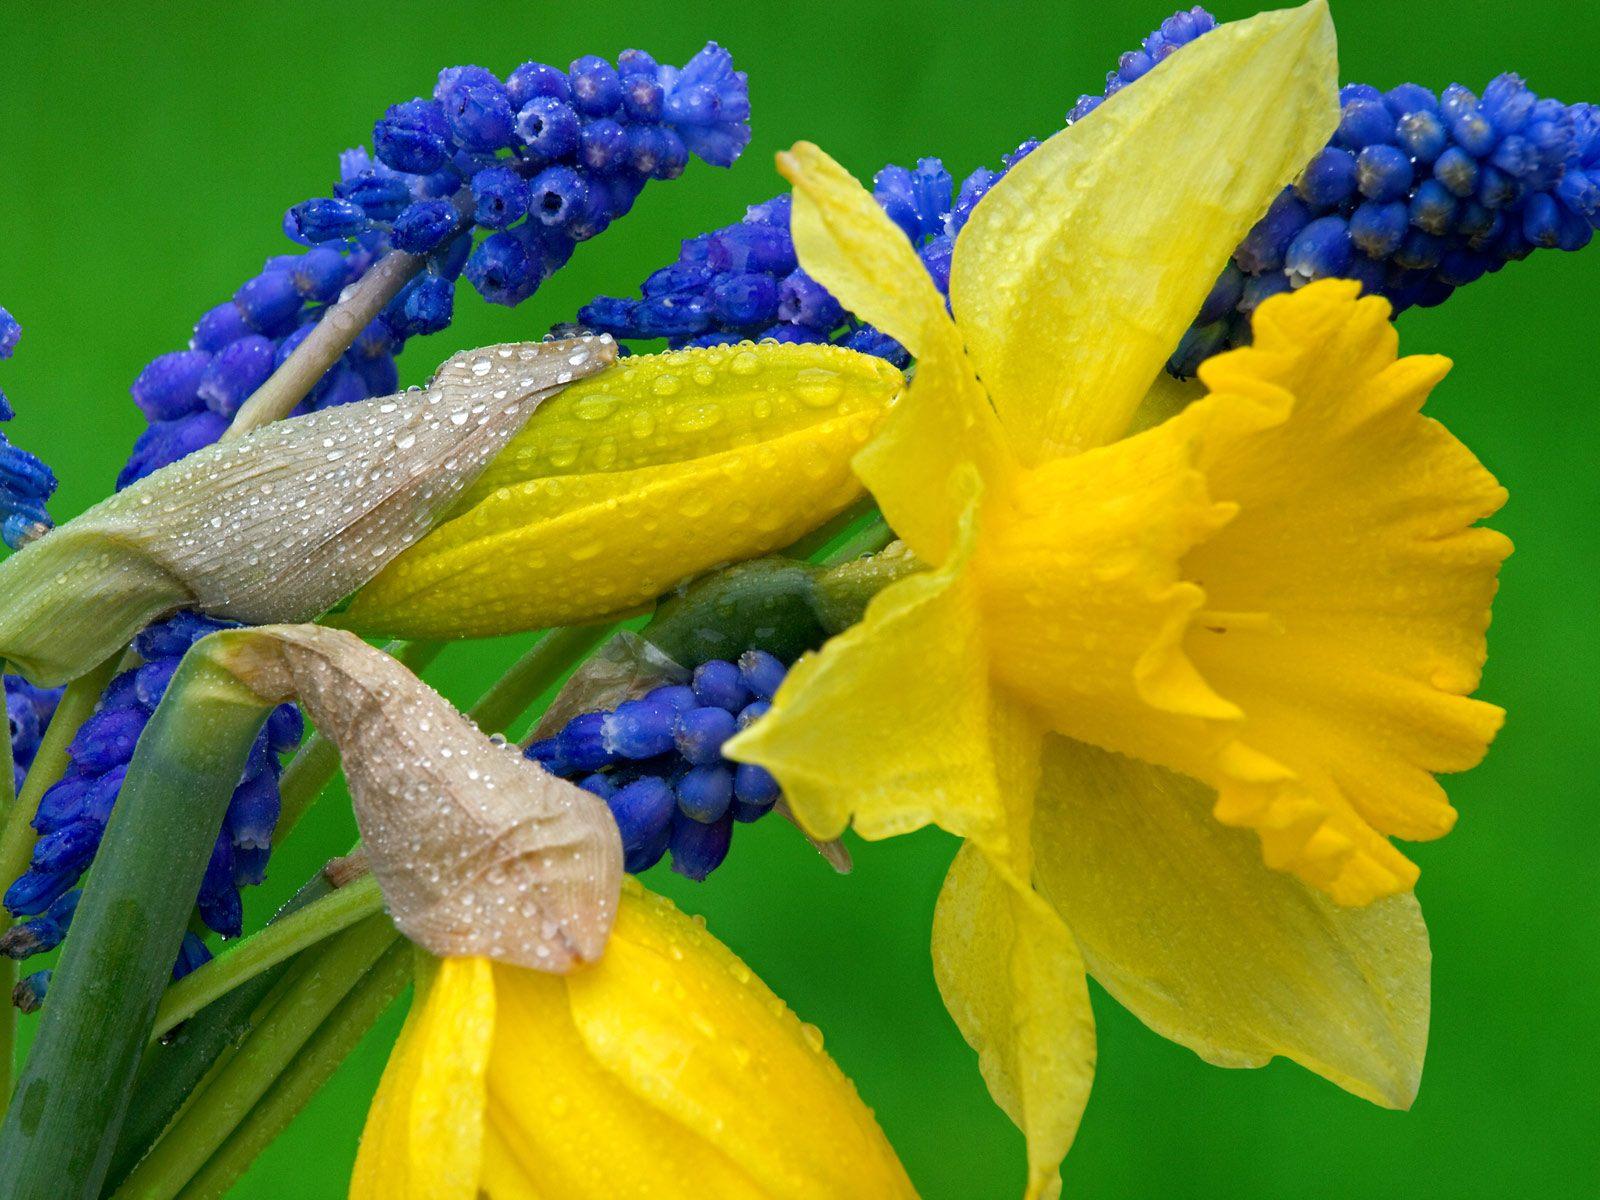 hyacinth flowers 20178